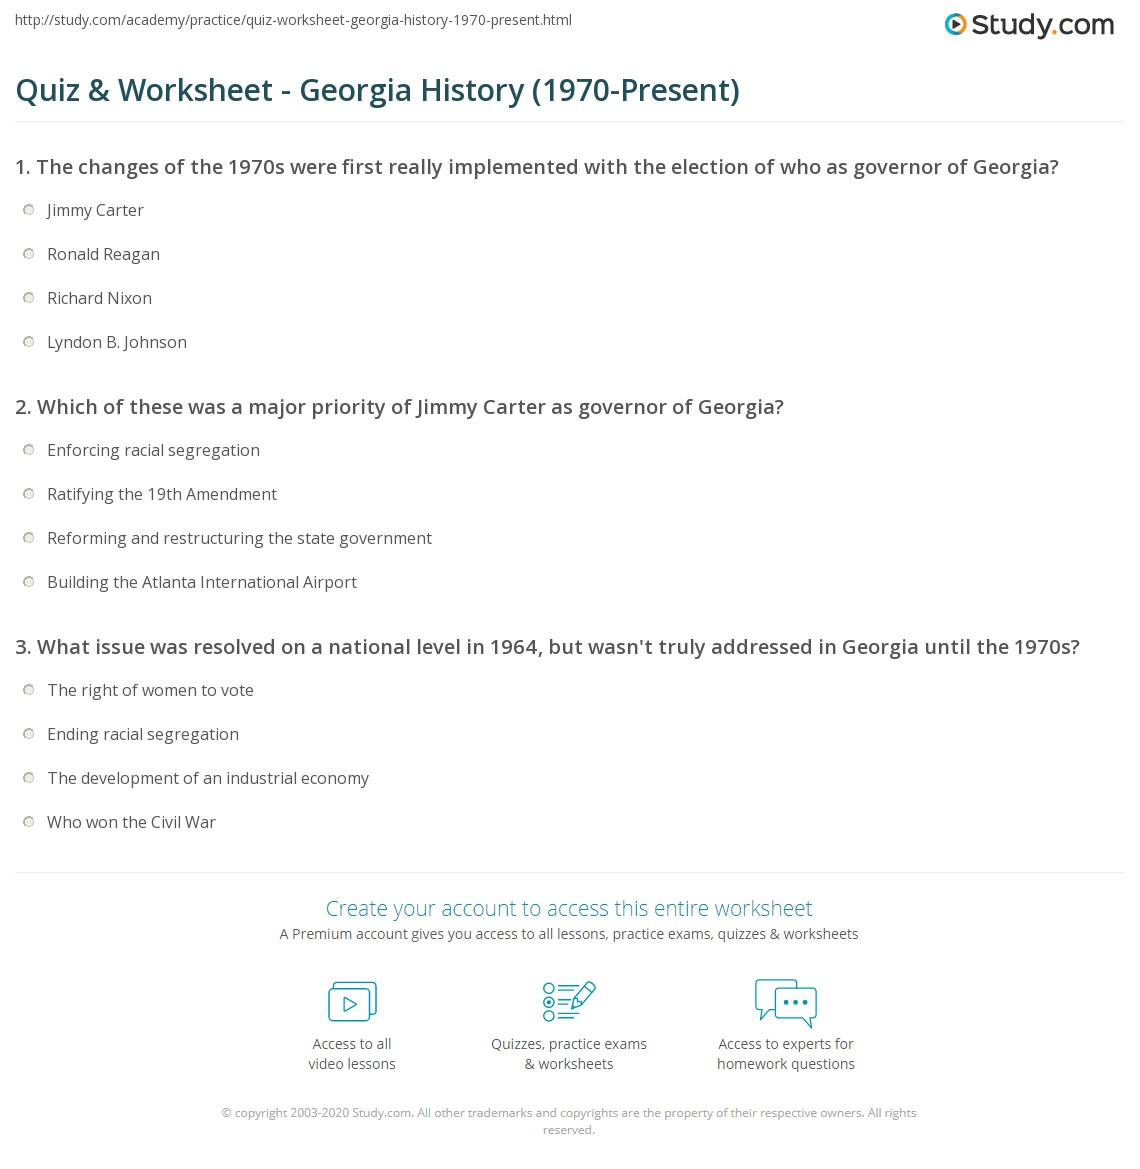 quiz worksheet georgia history 1970 present. Black Bedroom Furniture Sets. Home Design Ideas